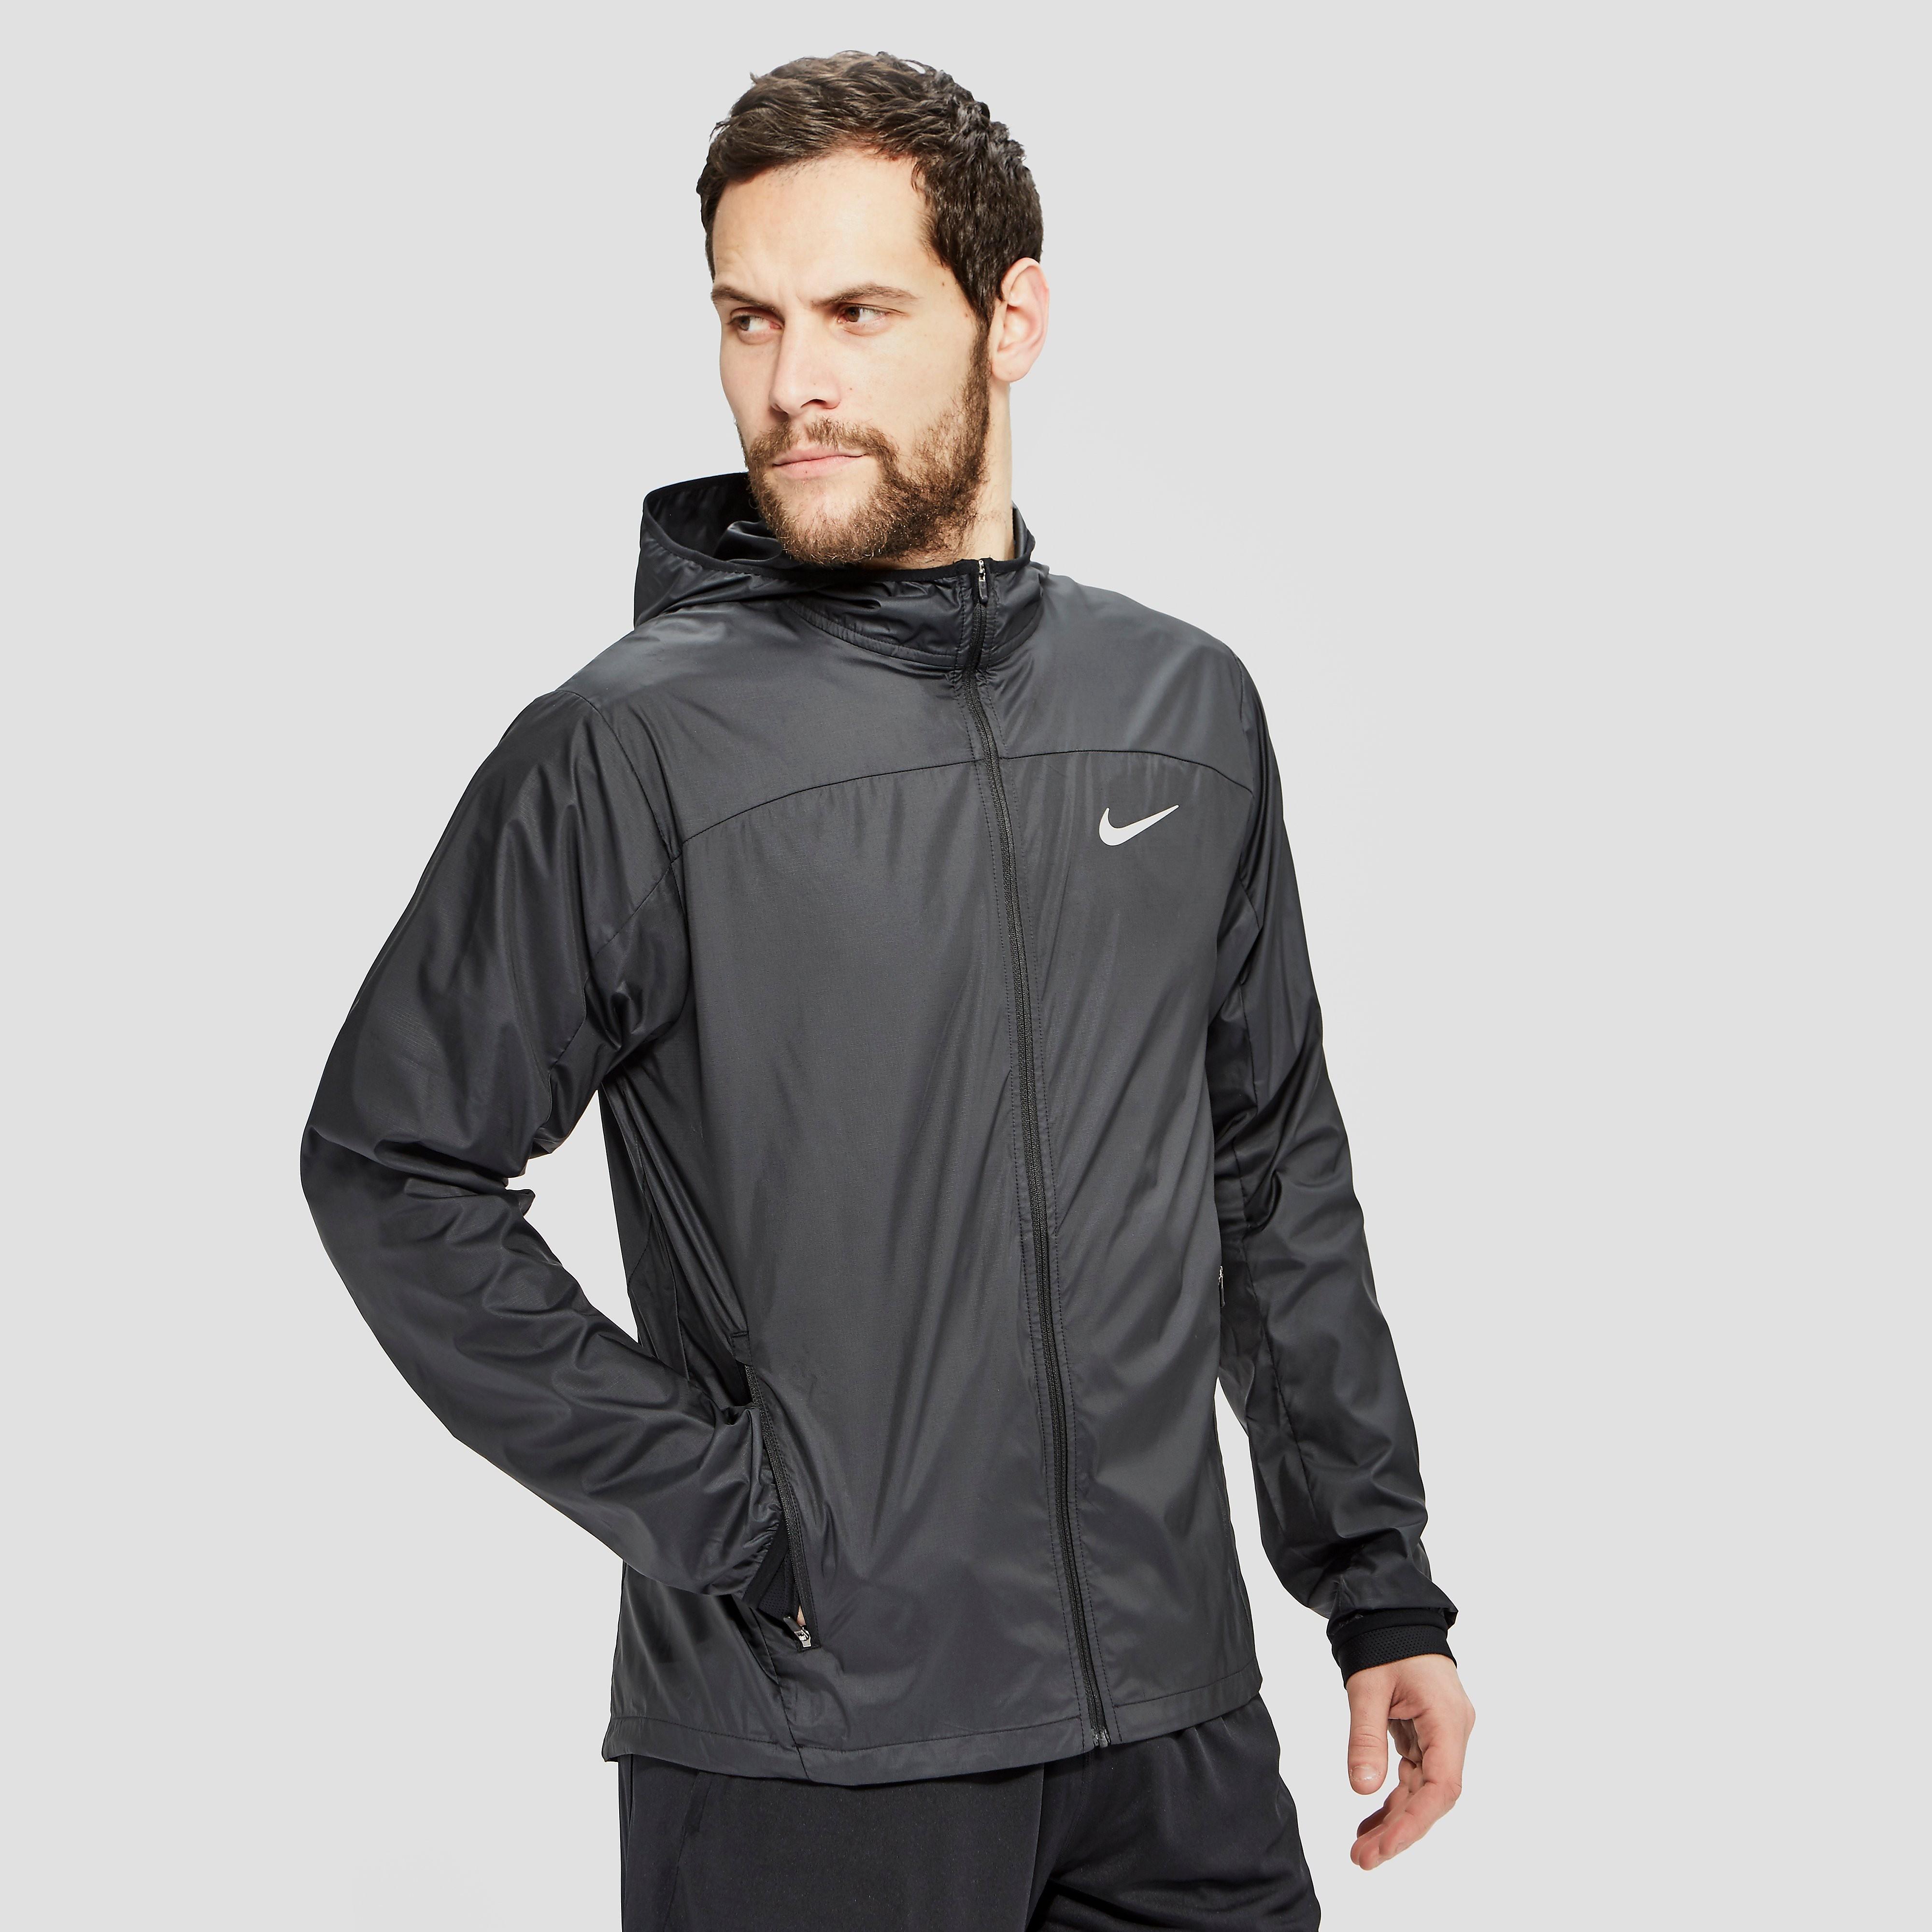 Nike RUN SHIELD HD Men's JacKeT